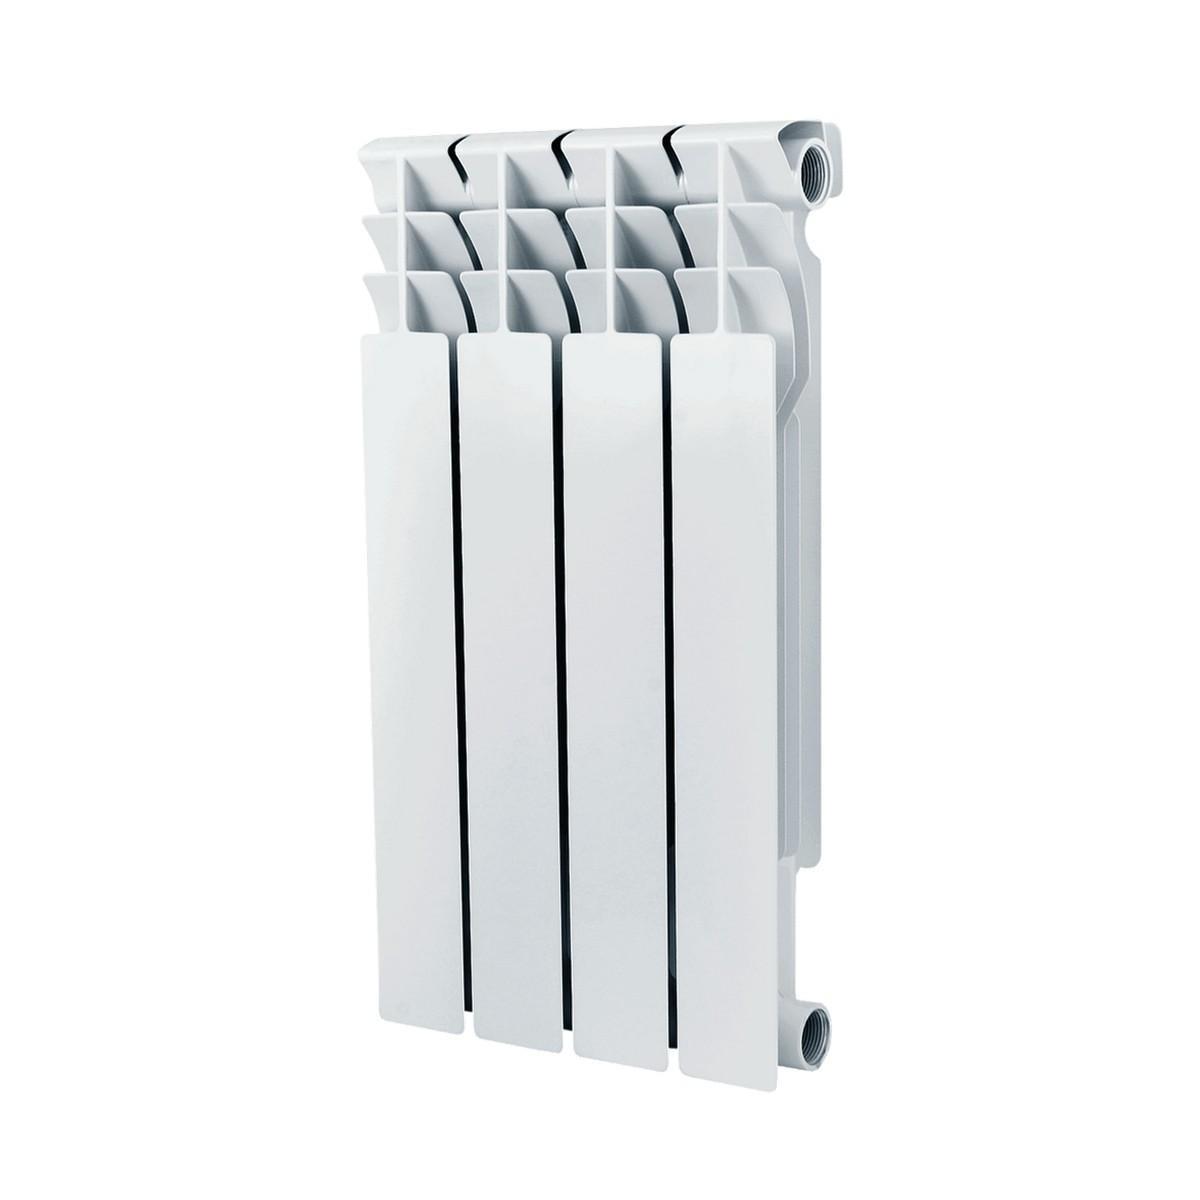 Радиатор биметалл Ultra Plus 500 12 секций Ogint  117-5979